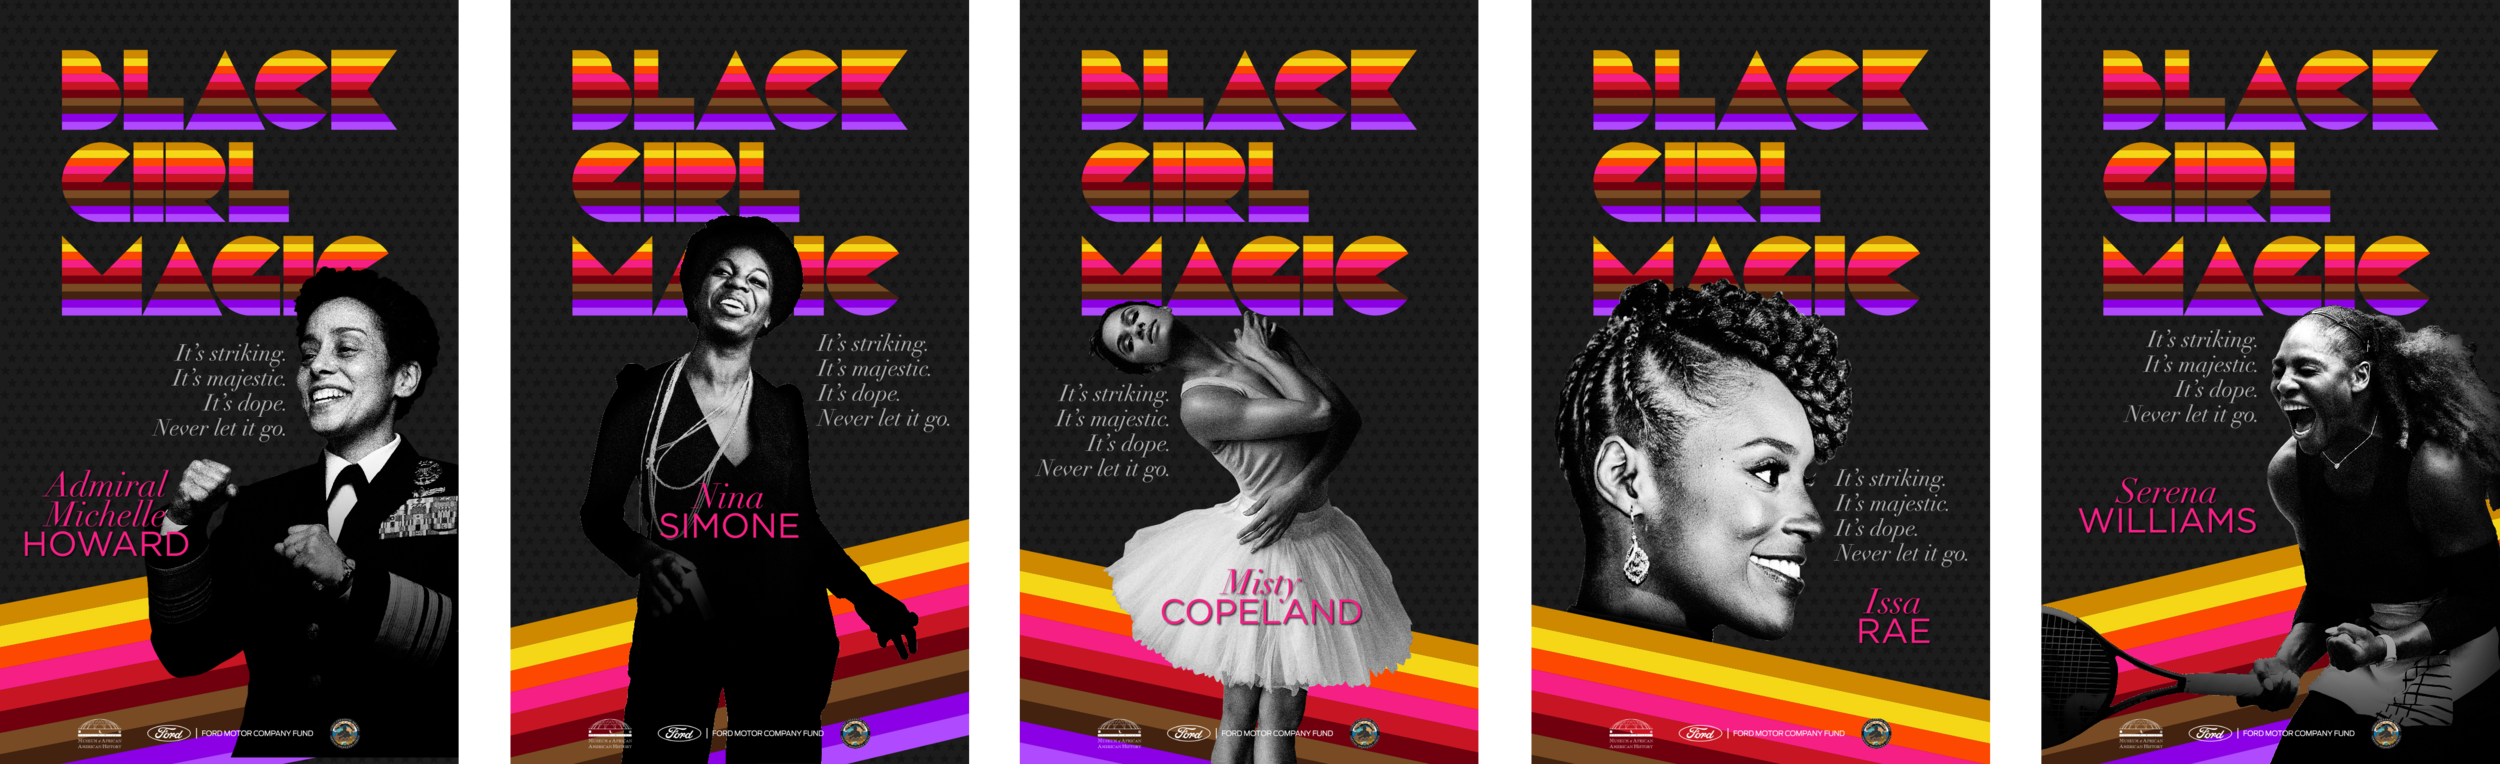 blackgirlmagic_posters.png